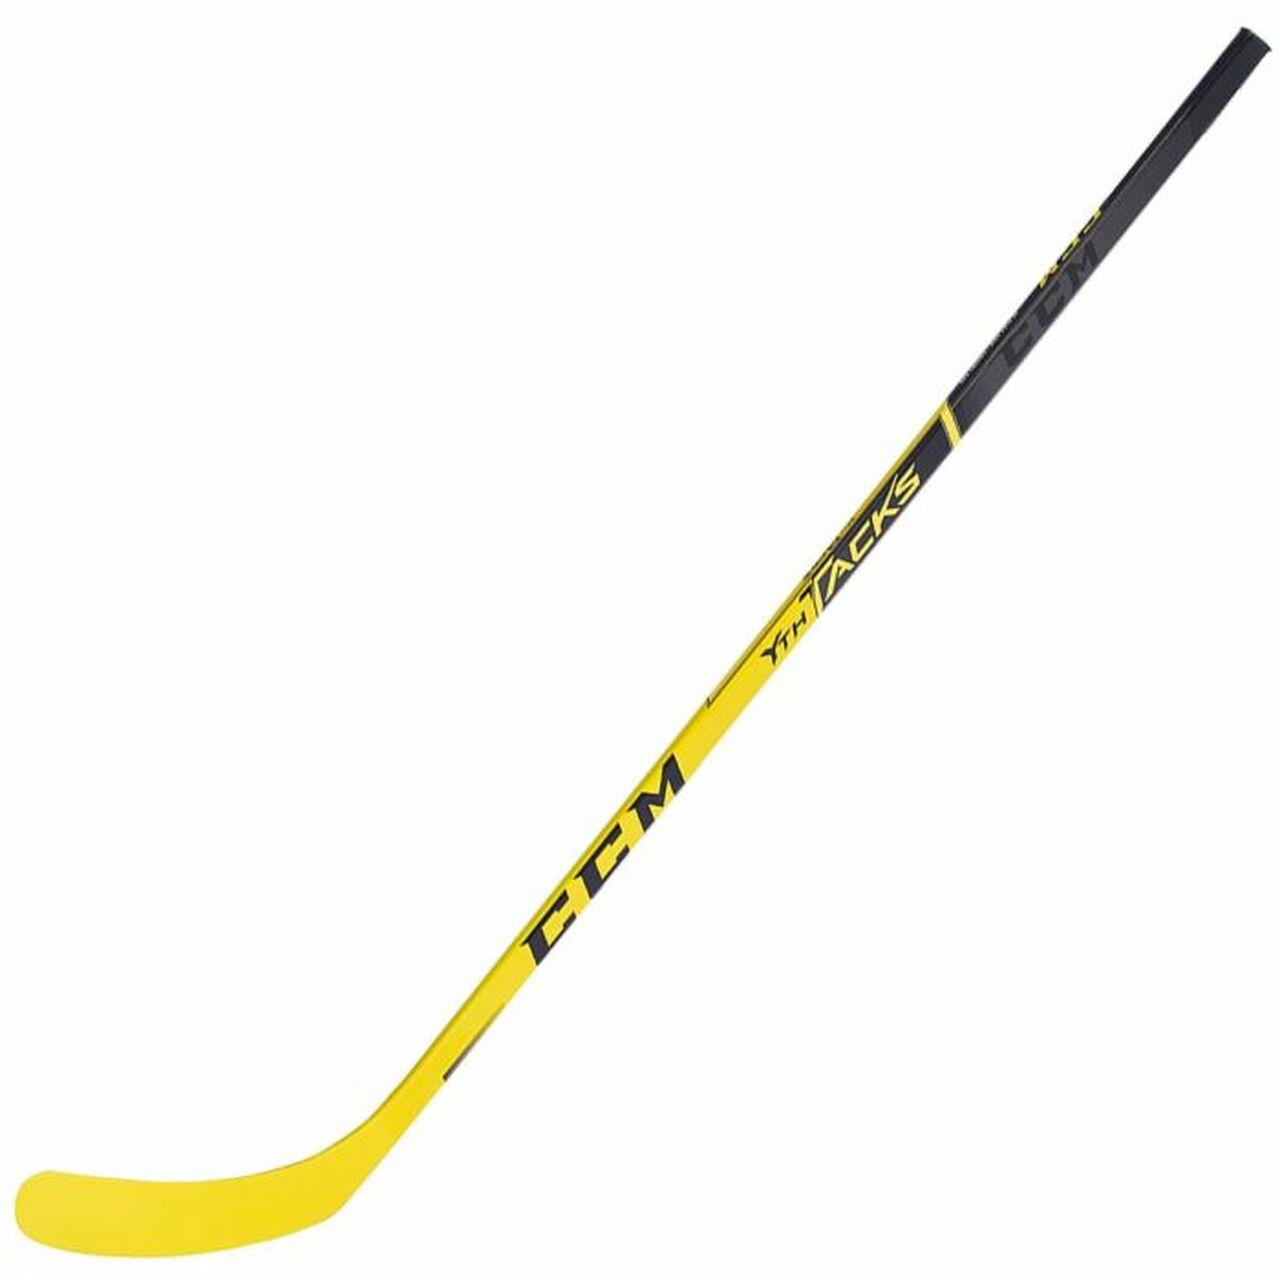 Best Upgrade Youth Stick